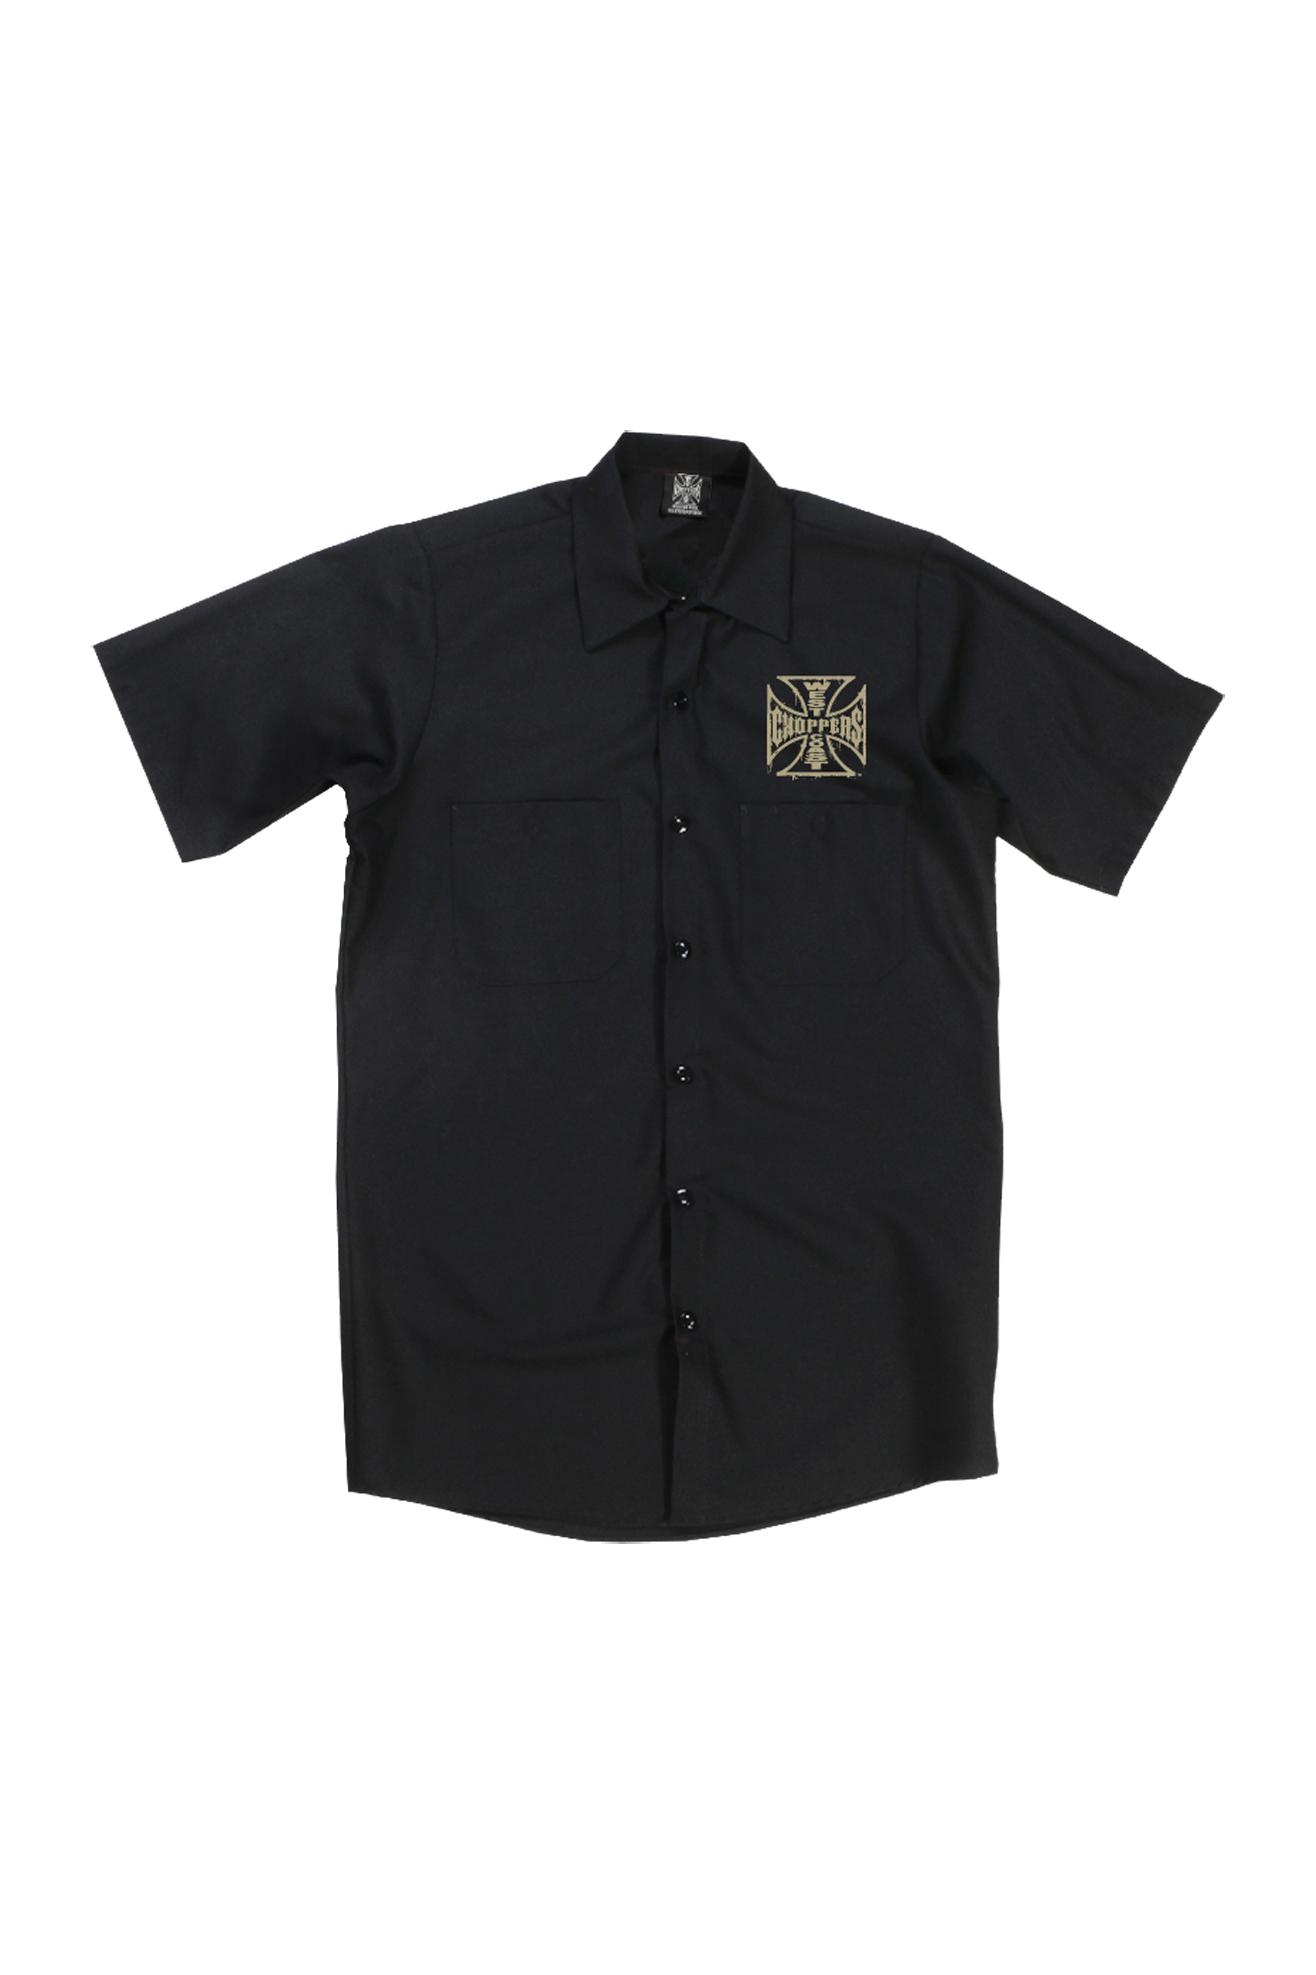 West Coast Choppers Camisa de Trabajo  Distressed OG Logo Negra